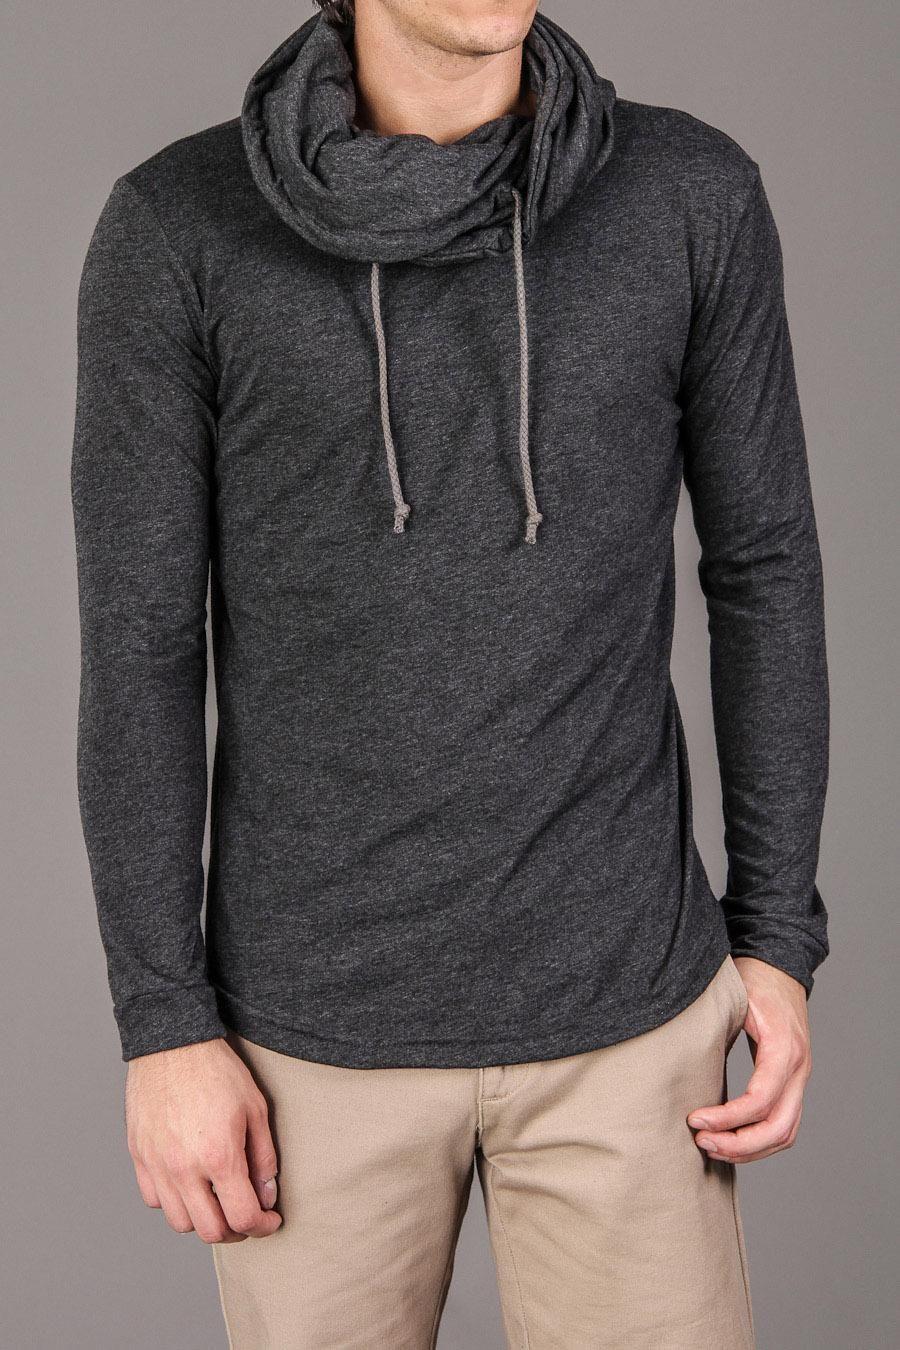 Lantern Cowl Collar Sweater Guy style Pinterest Menus fashion